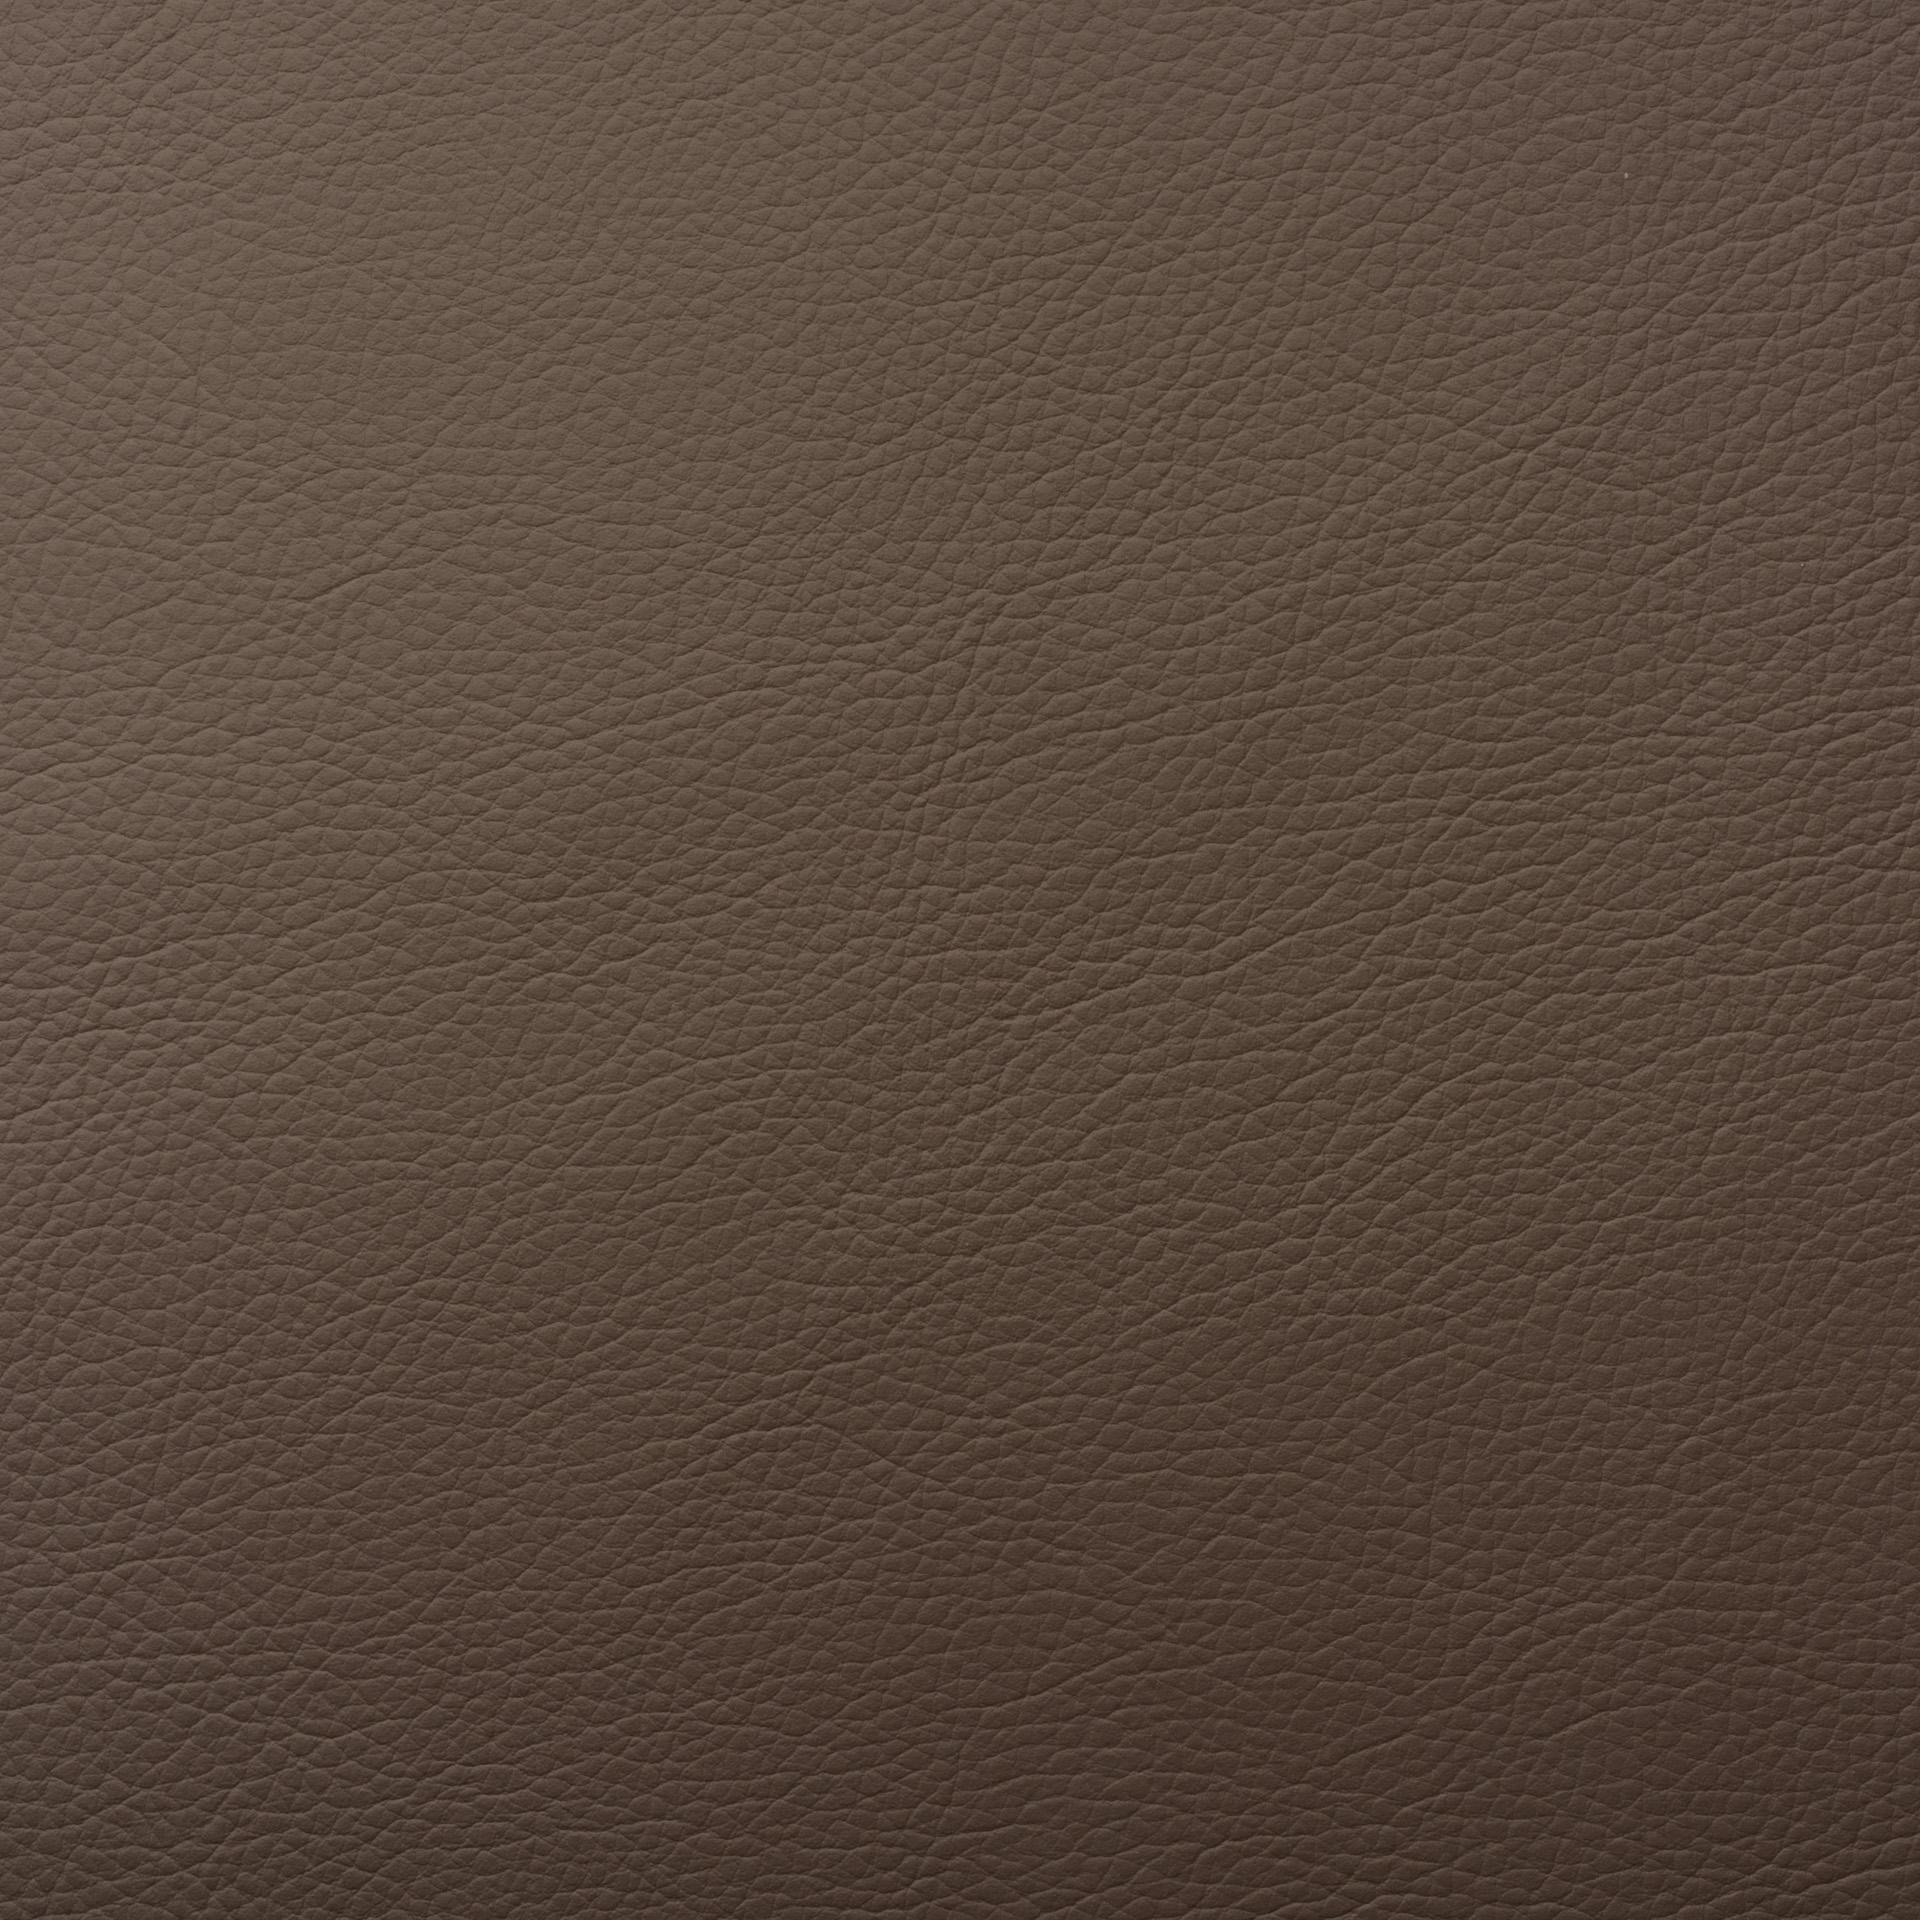 Коллекция ткани Леонардо Каппеллини 09 WIND CHILL,  купить ткань Кож зам для мебели Украина